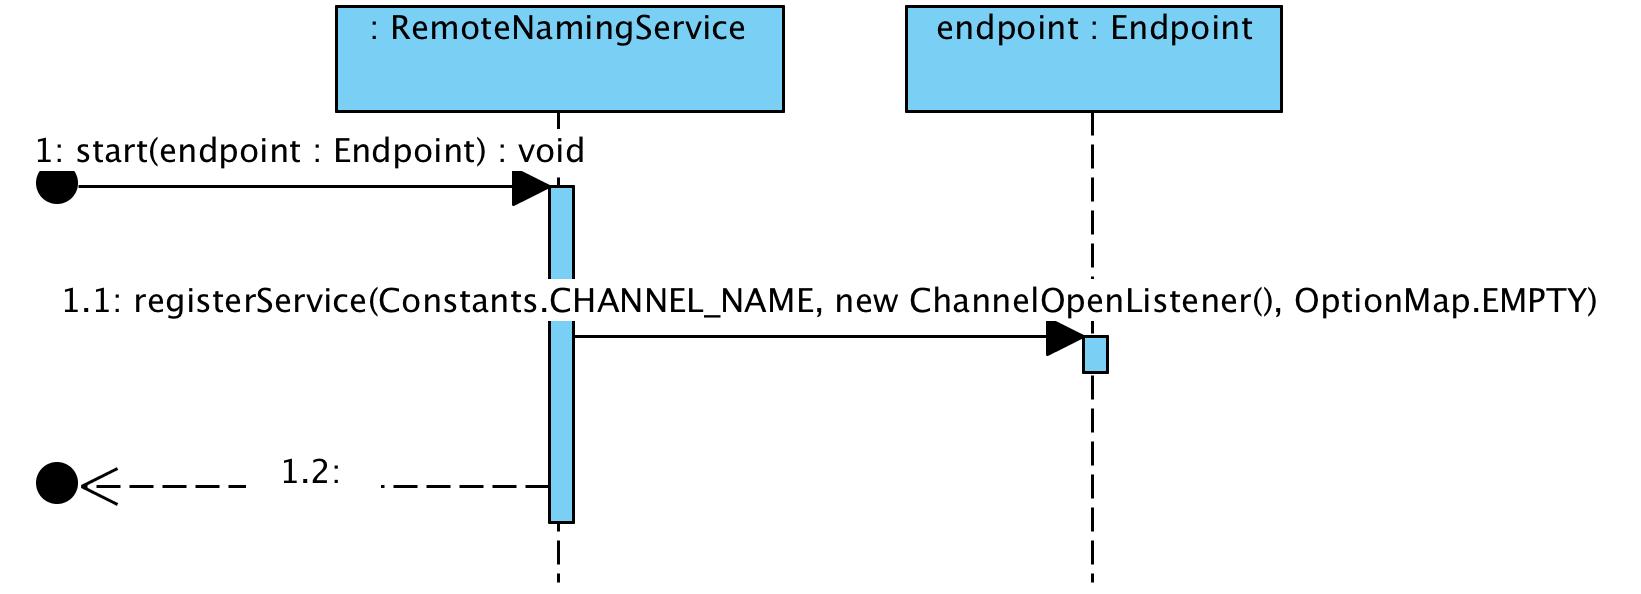 https://raw.githubusercontent.com/liweinan/blogpicbackup/master/data/naming/org.jboss.naming.remote.server.RemoteNamingService.start(Endpoint).png